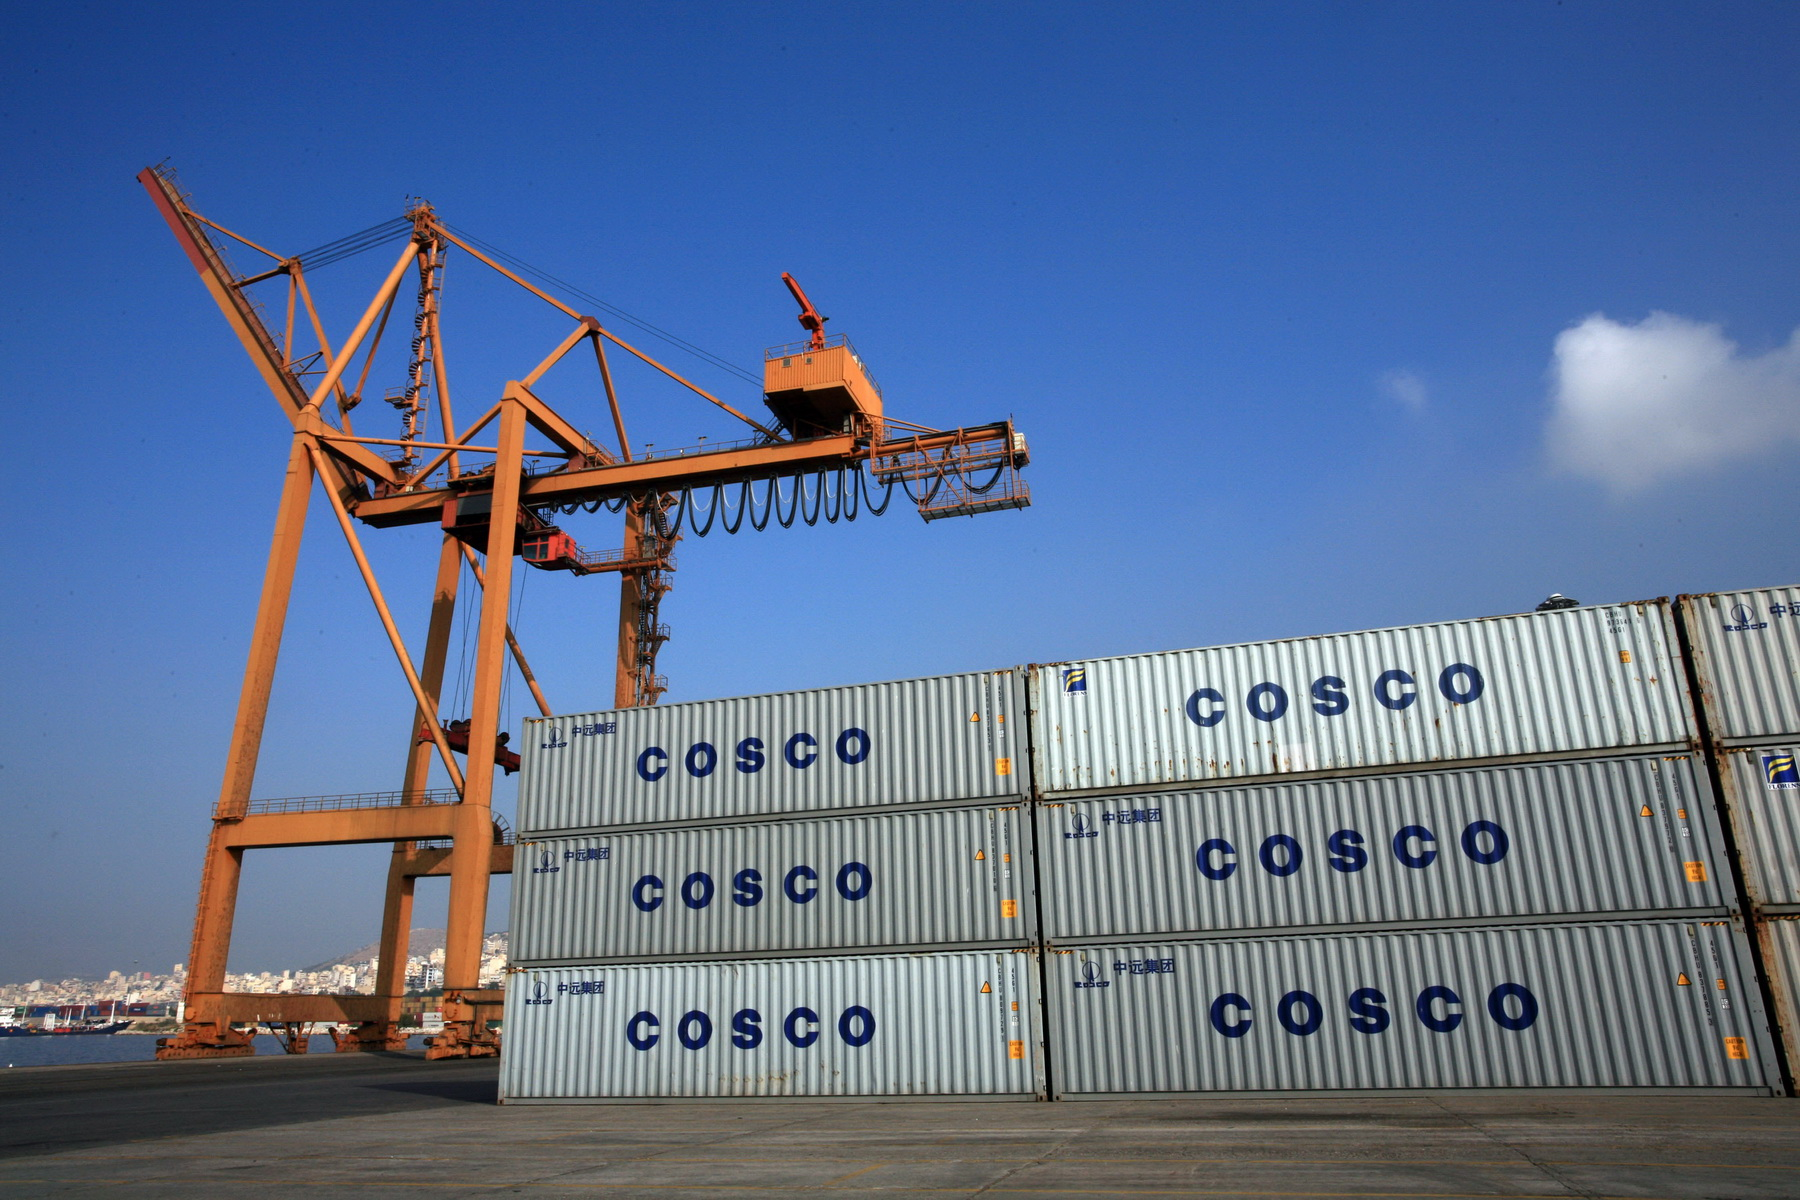 FT: Γιατί οι Κινέζοι Ξοδεύουν 20 Δις Δολάρια σε Αγορές Λιμανιών